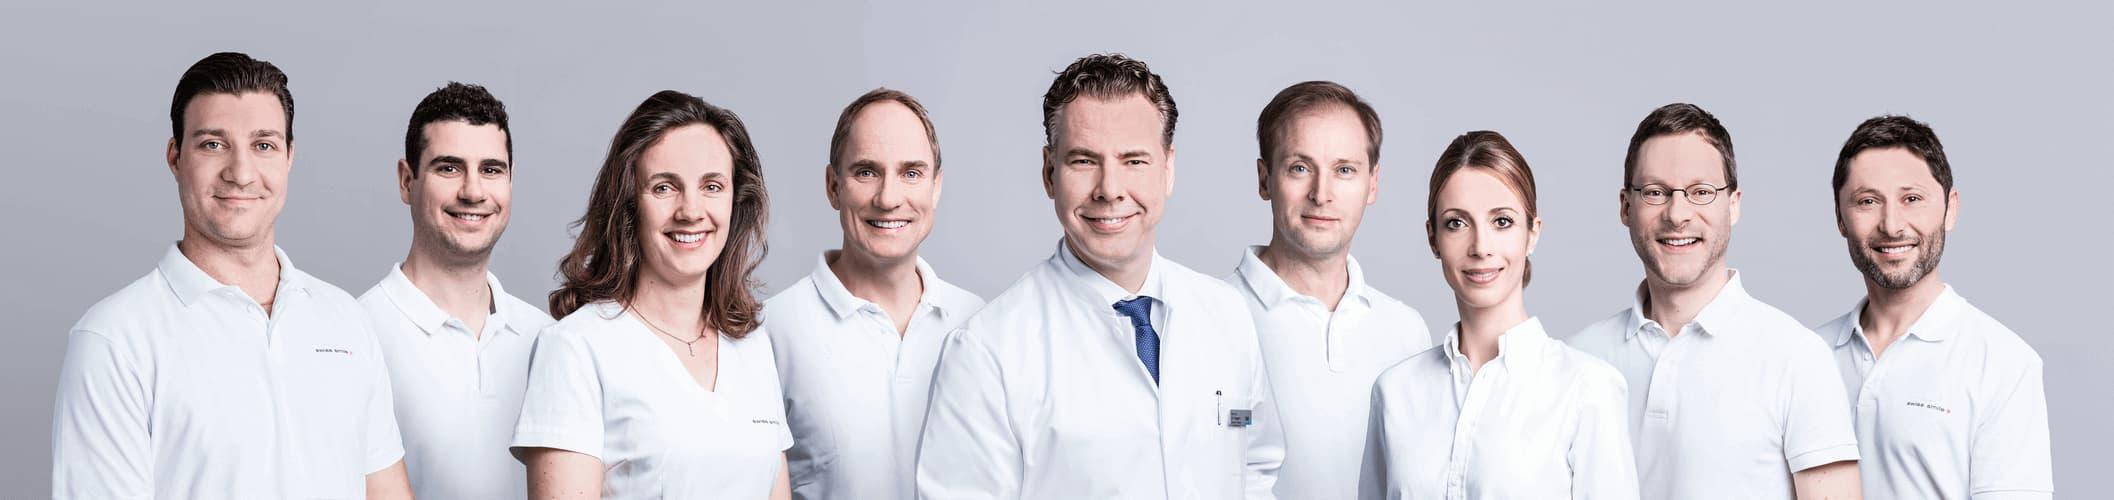 Team - Implantatzentrum Schweiz